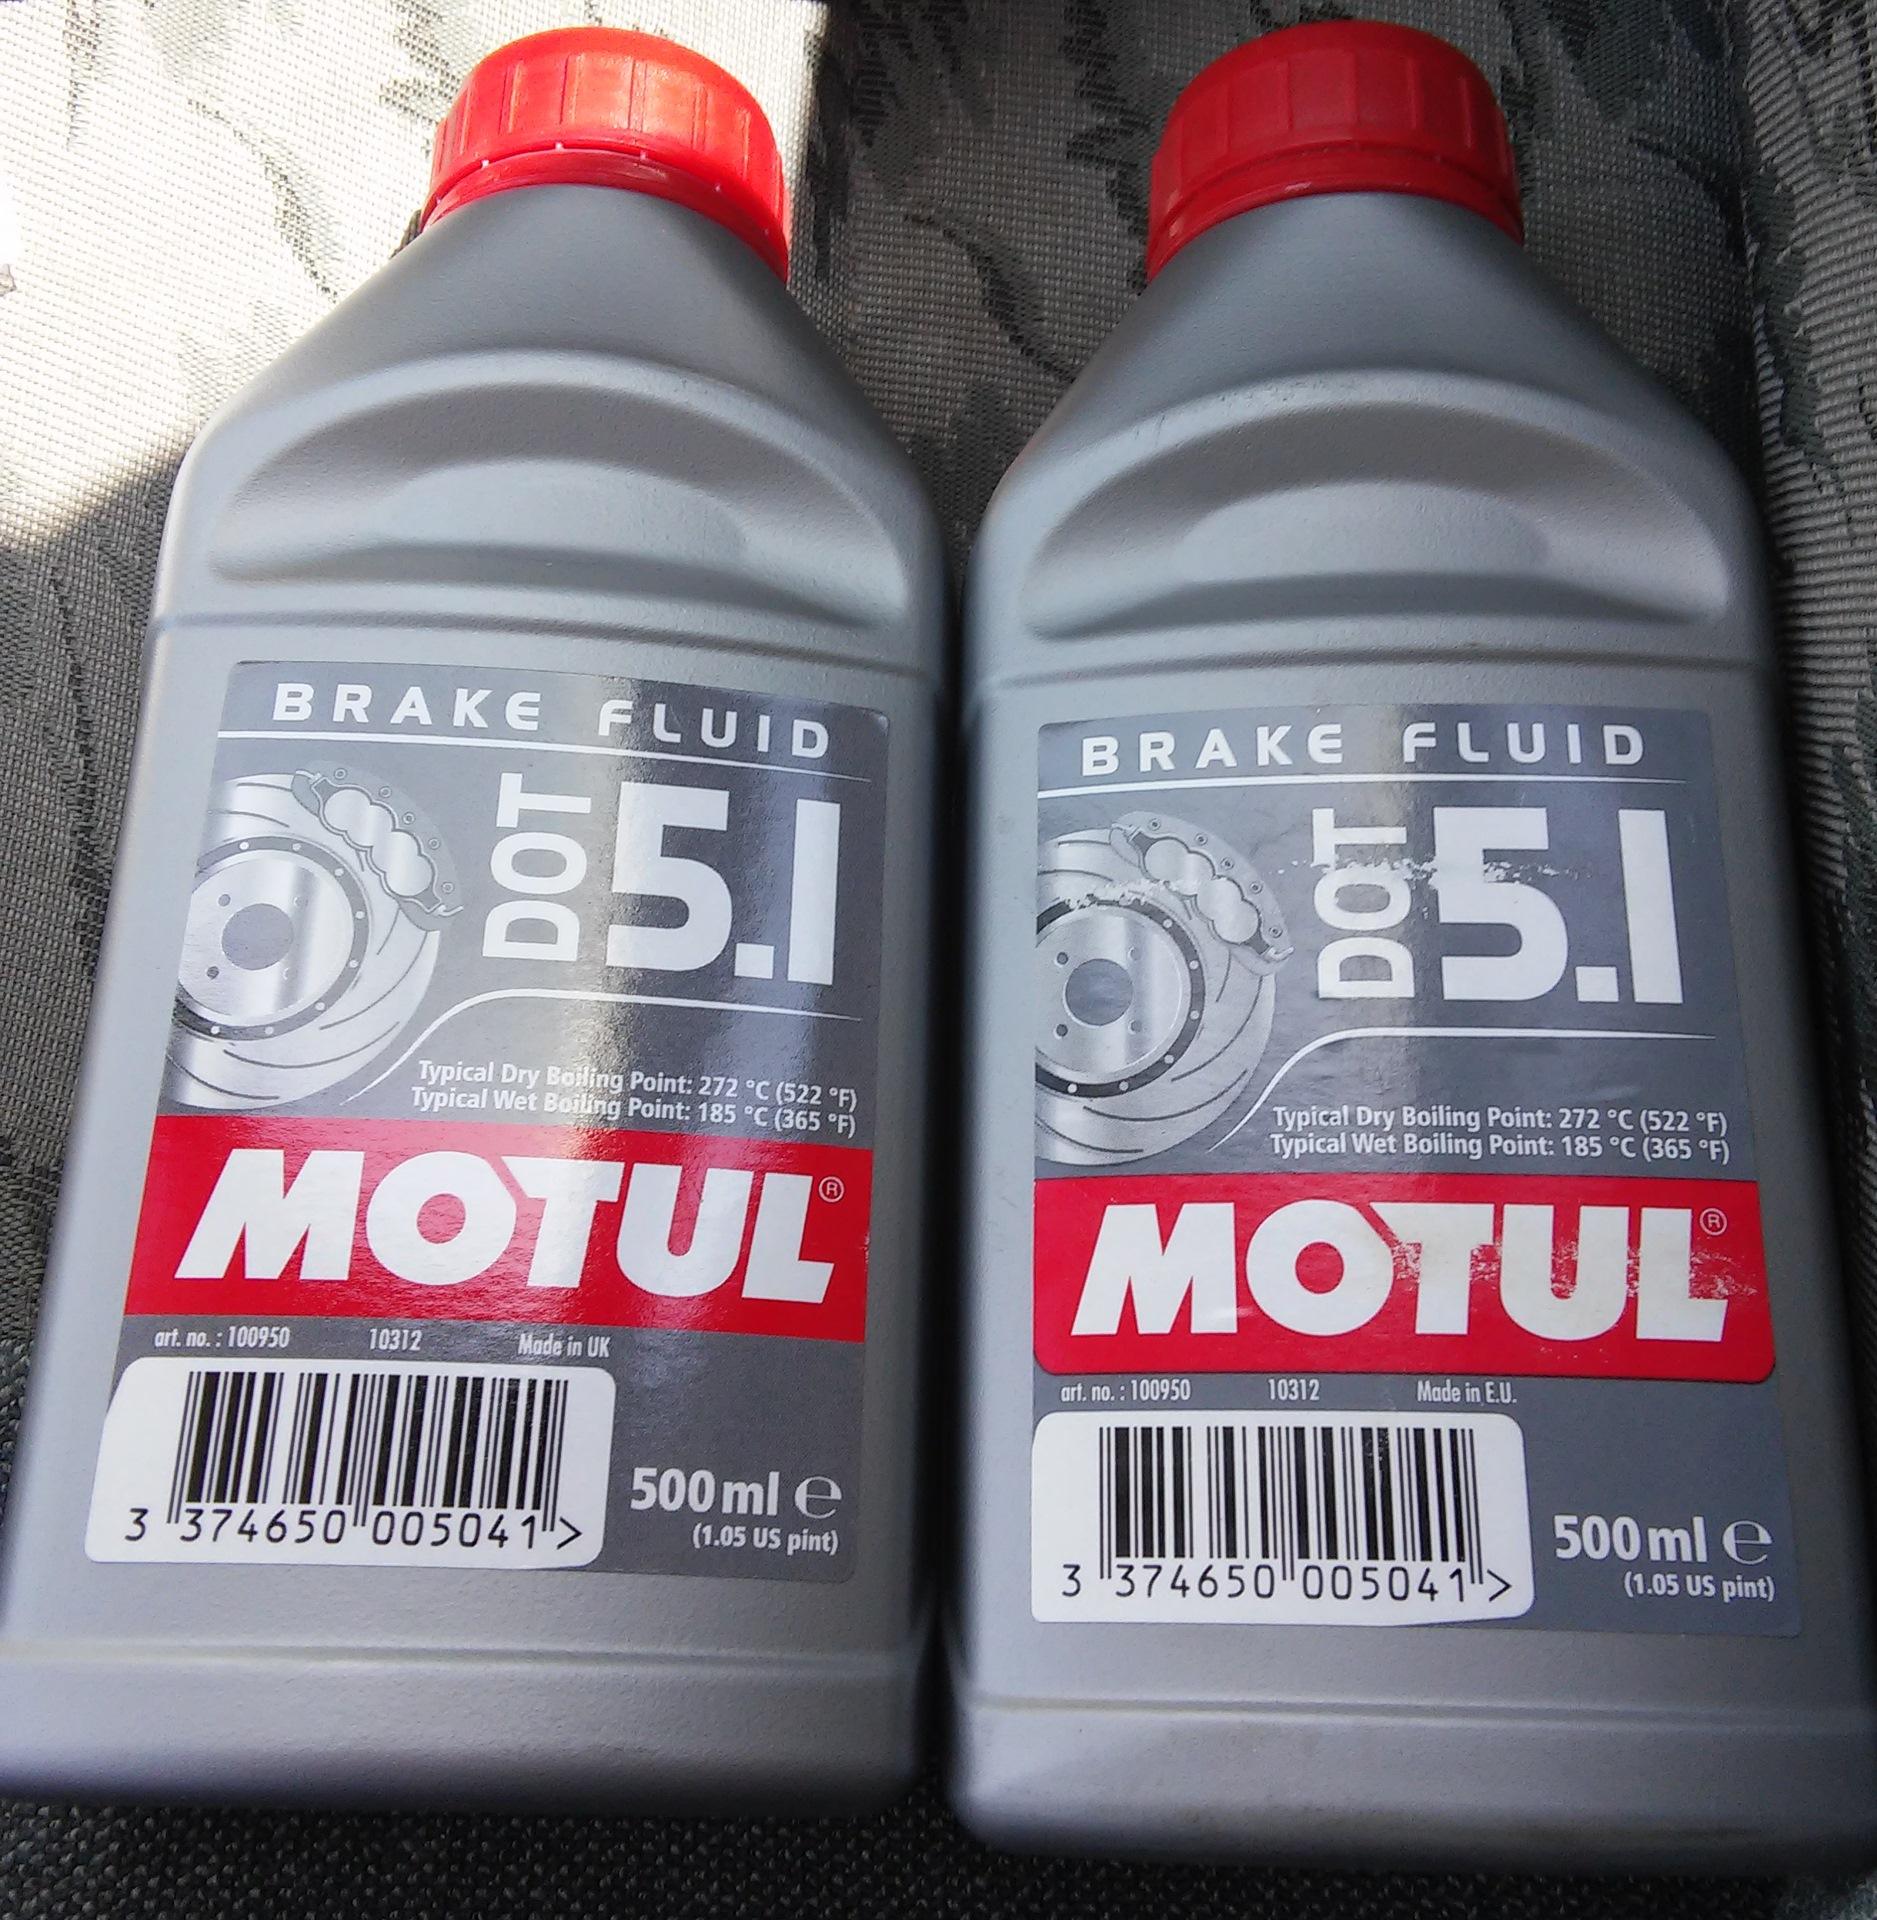 MOTUL DOT 5 1 BRAKE FLUID или тормозуха куплена!   — Mazda 3